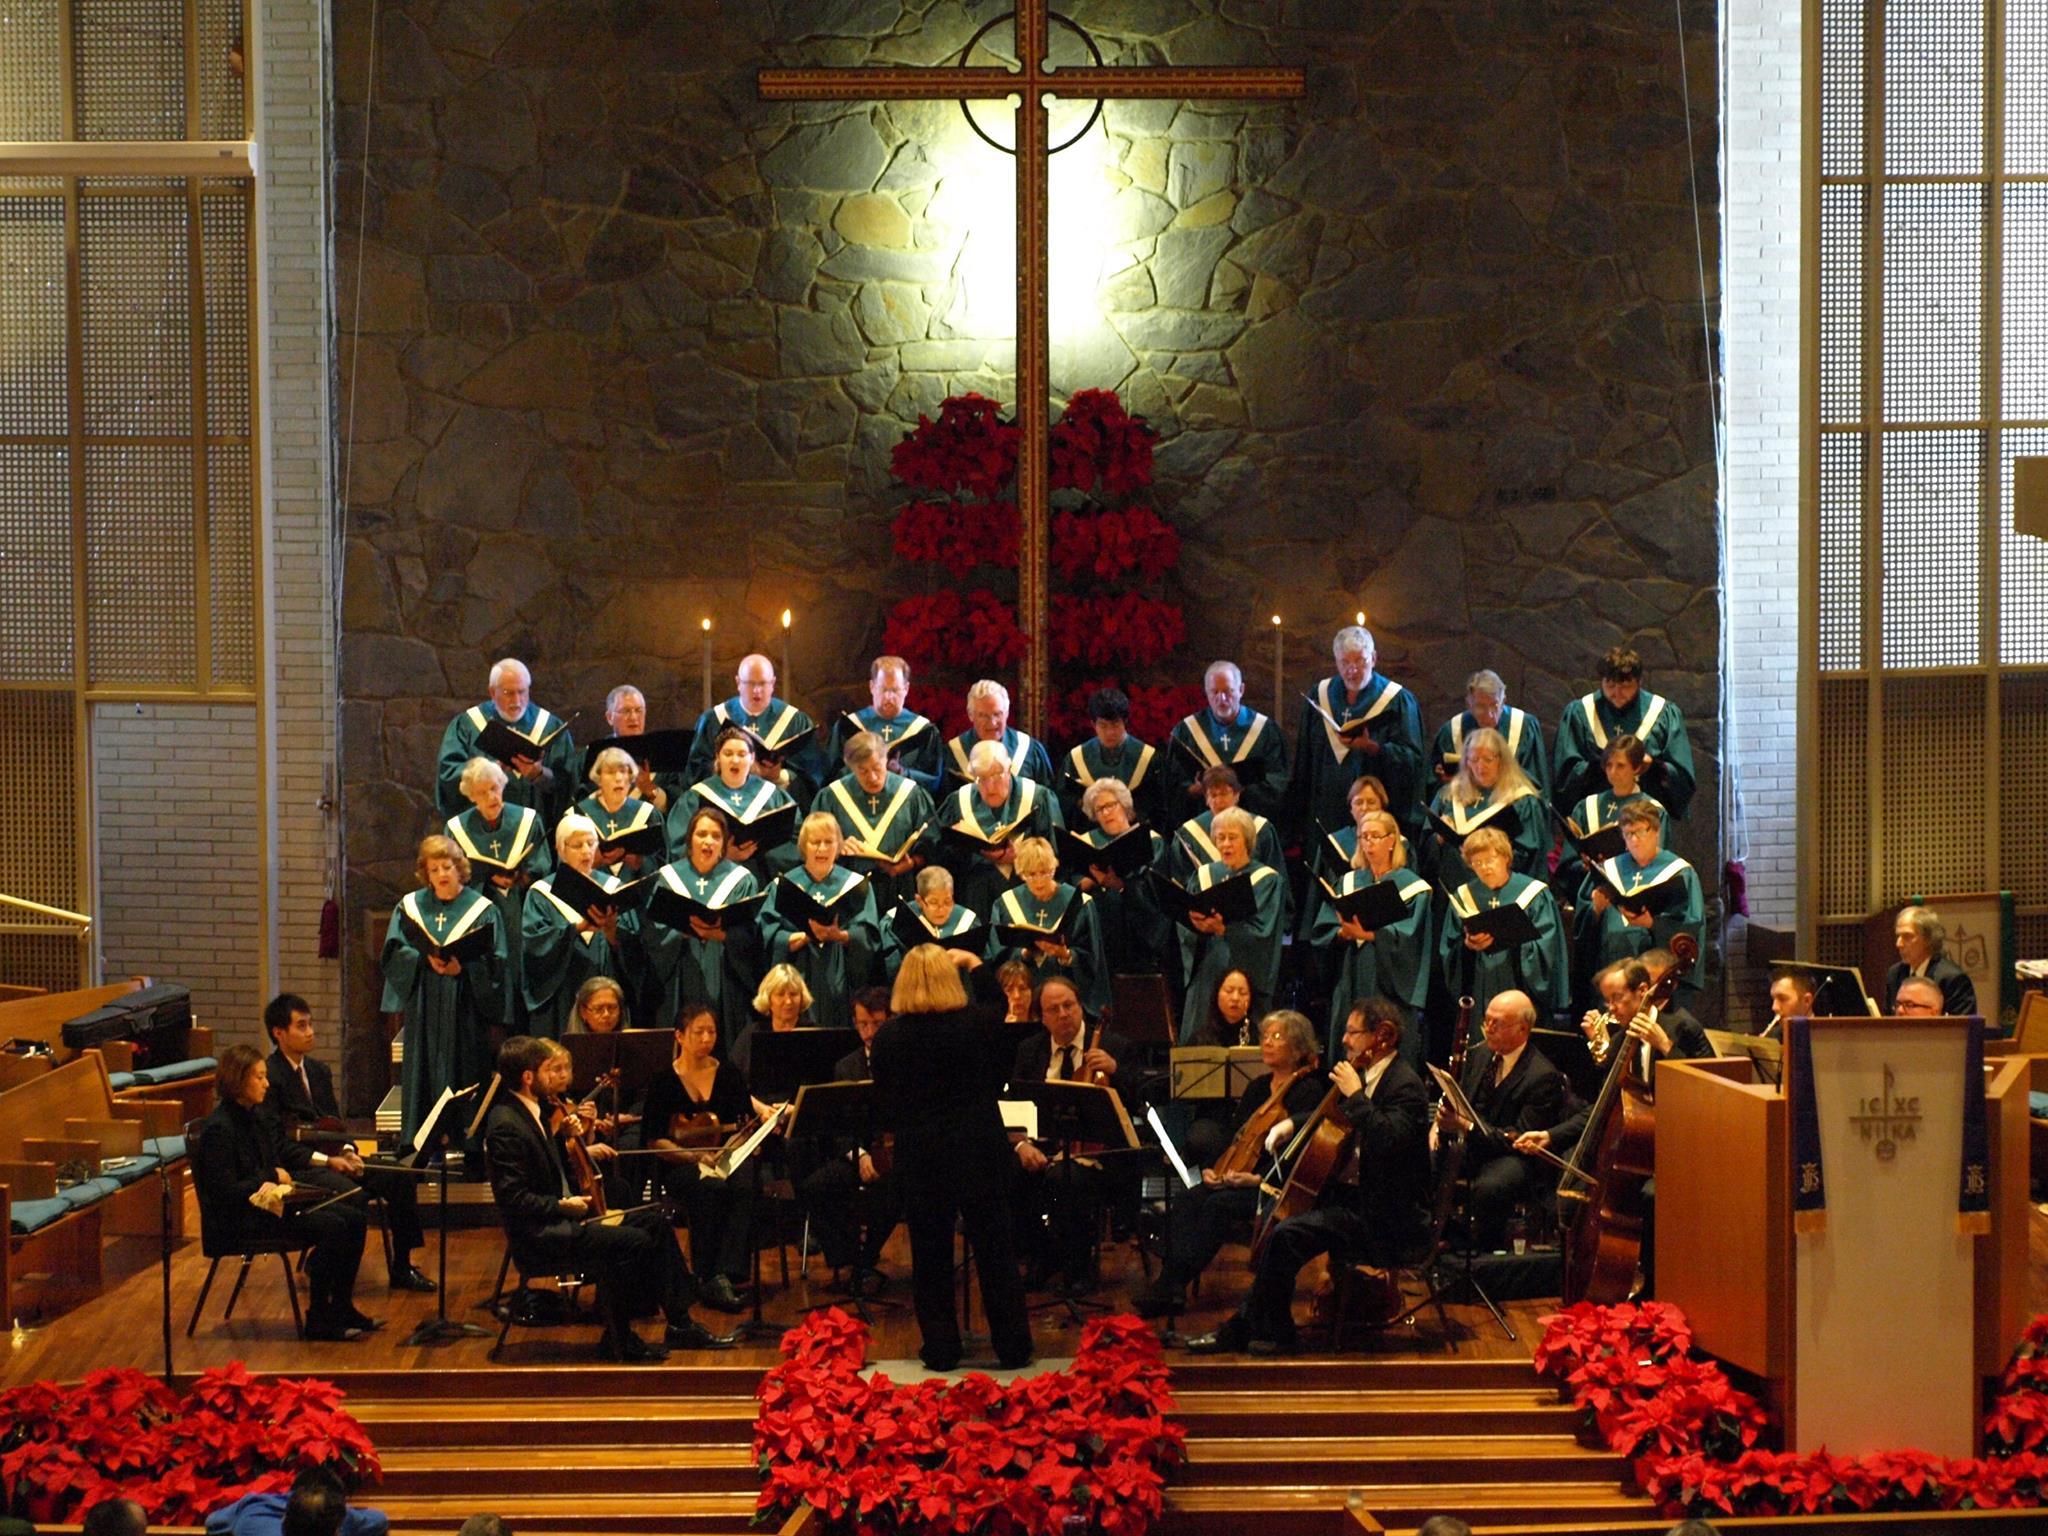 claremont-presbyterian-church-christmas-service-choir.jpg